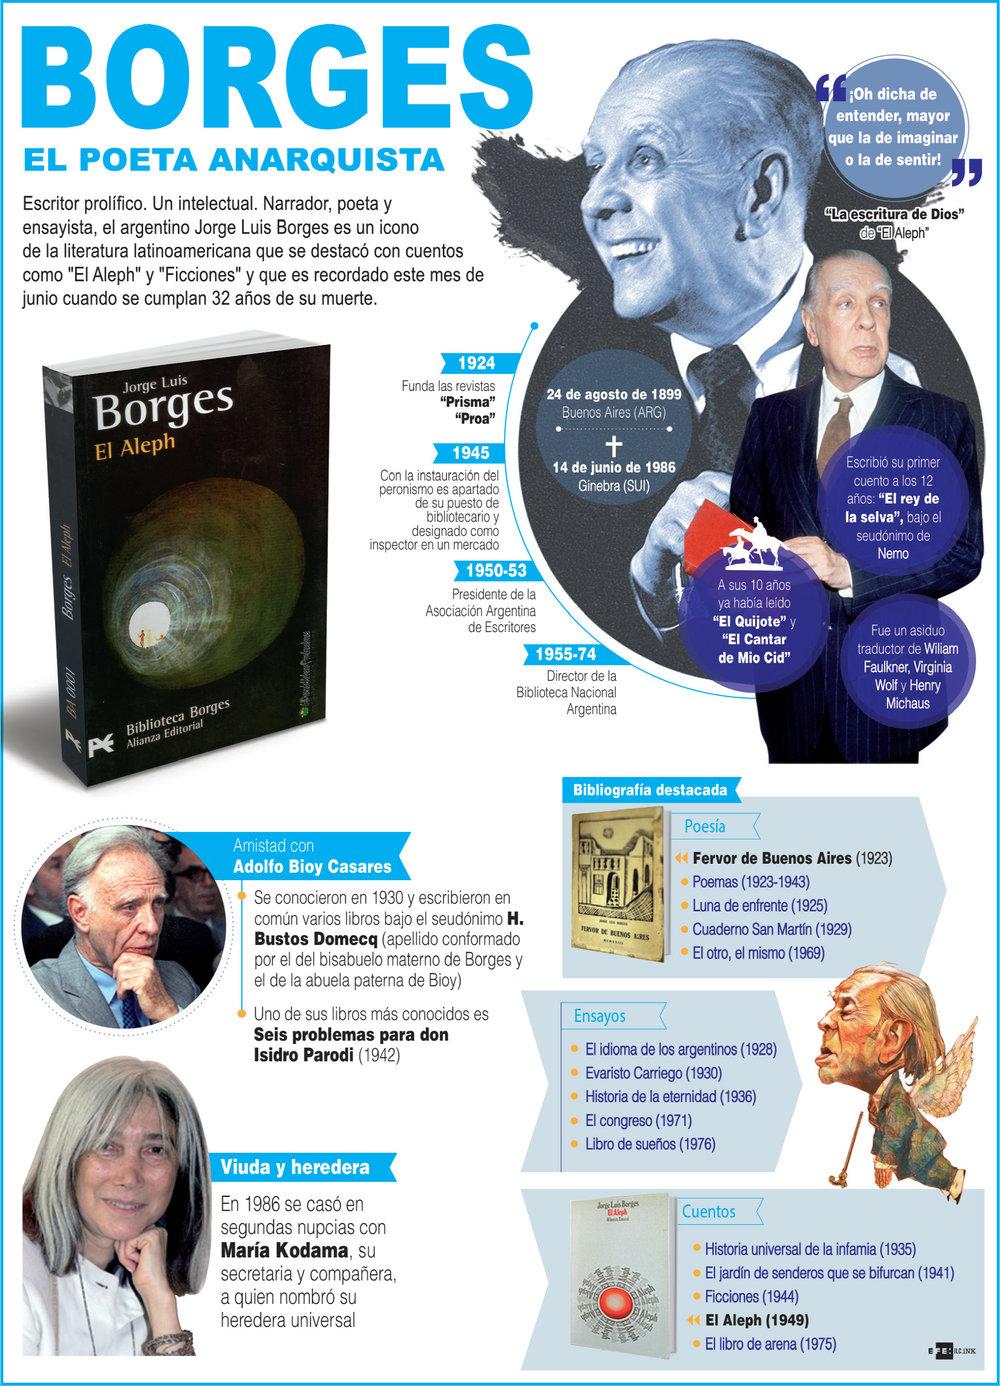 Borges.jpg